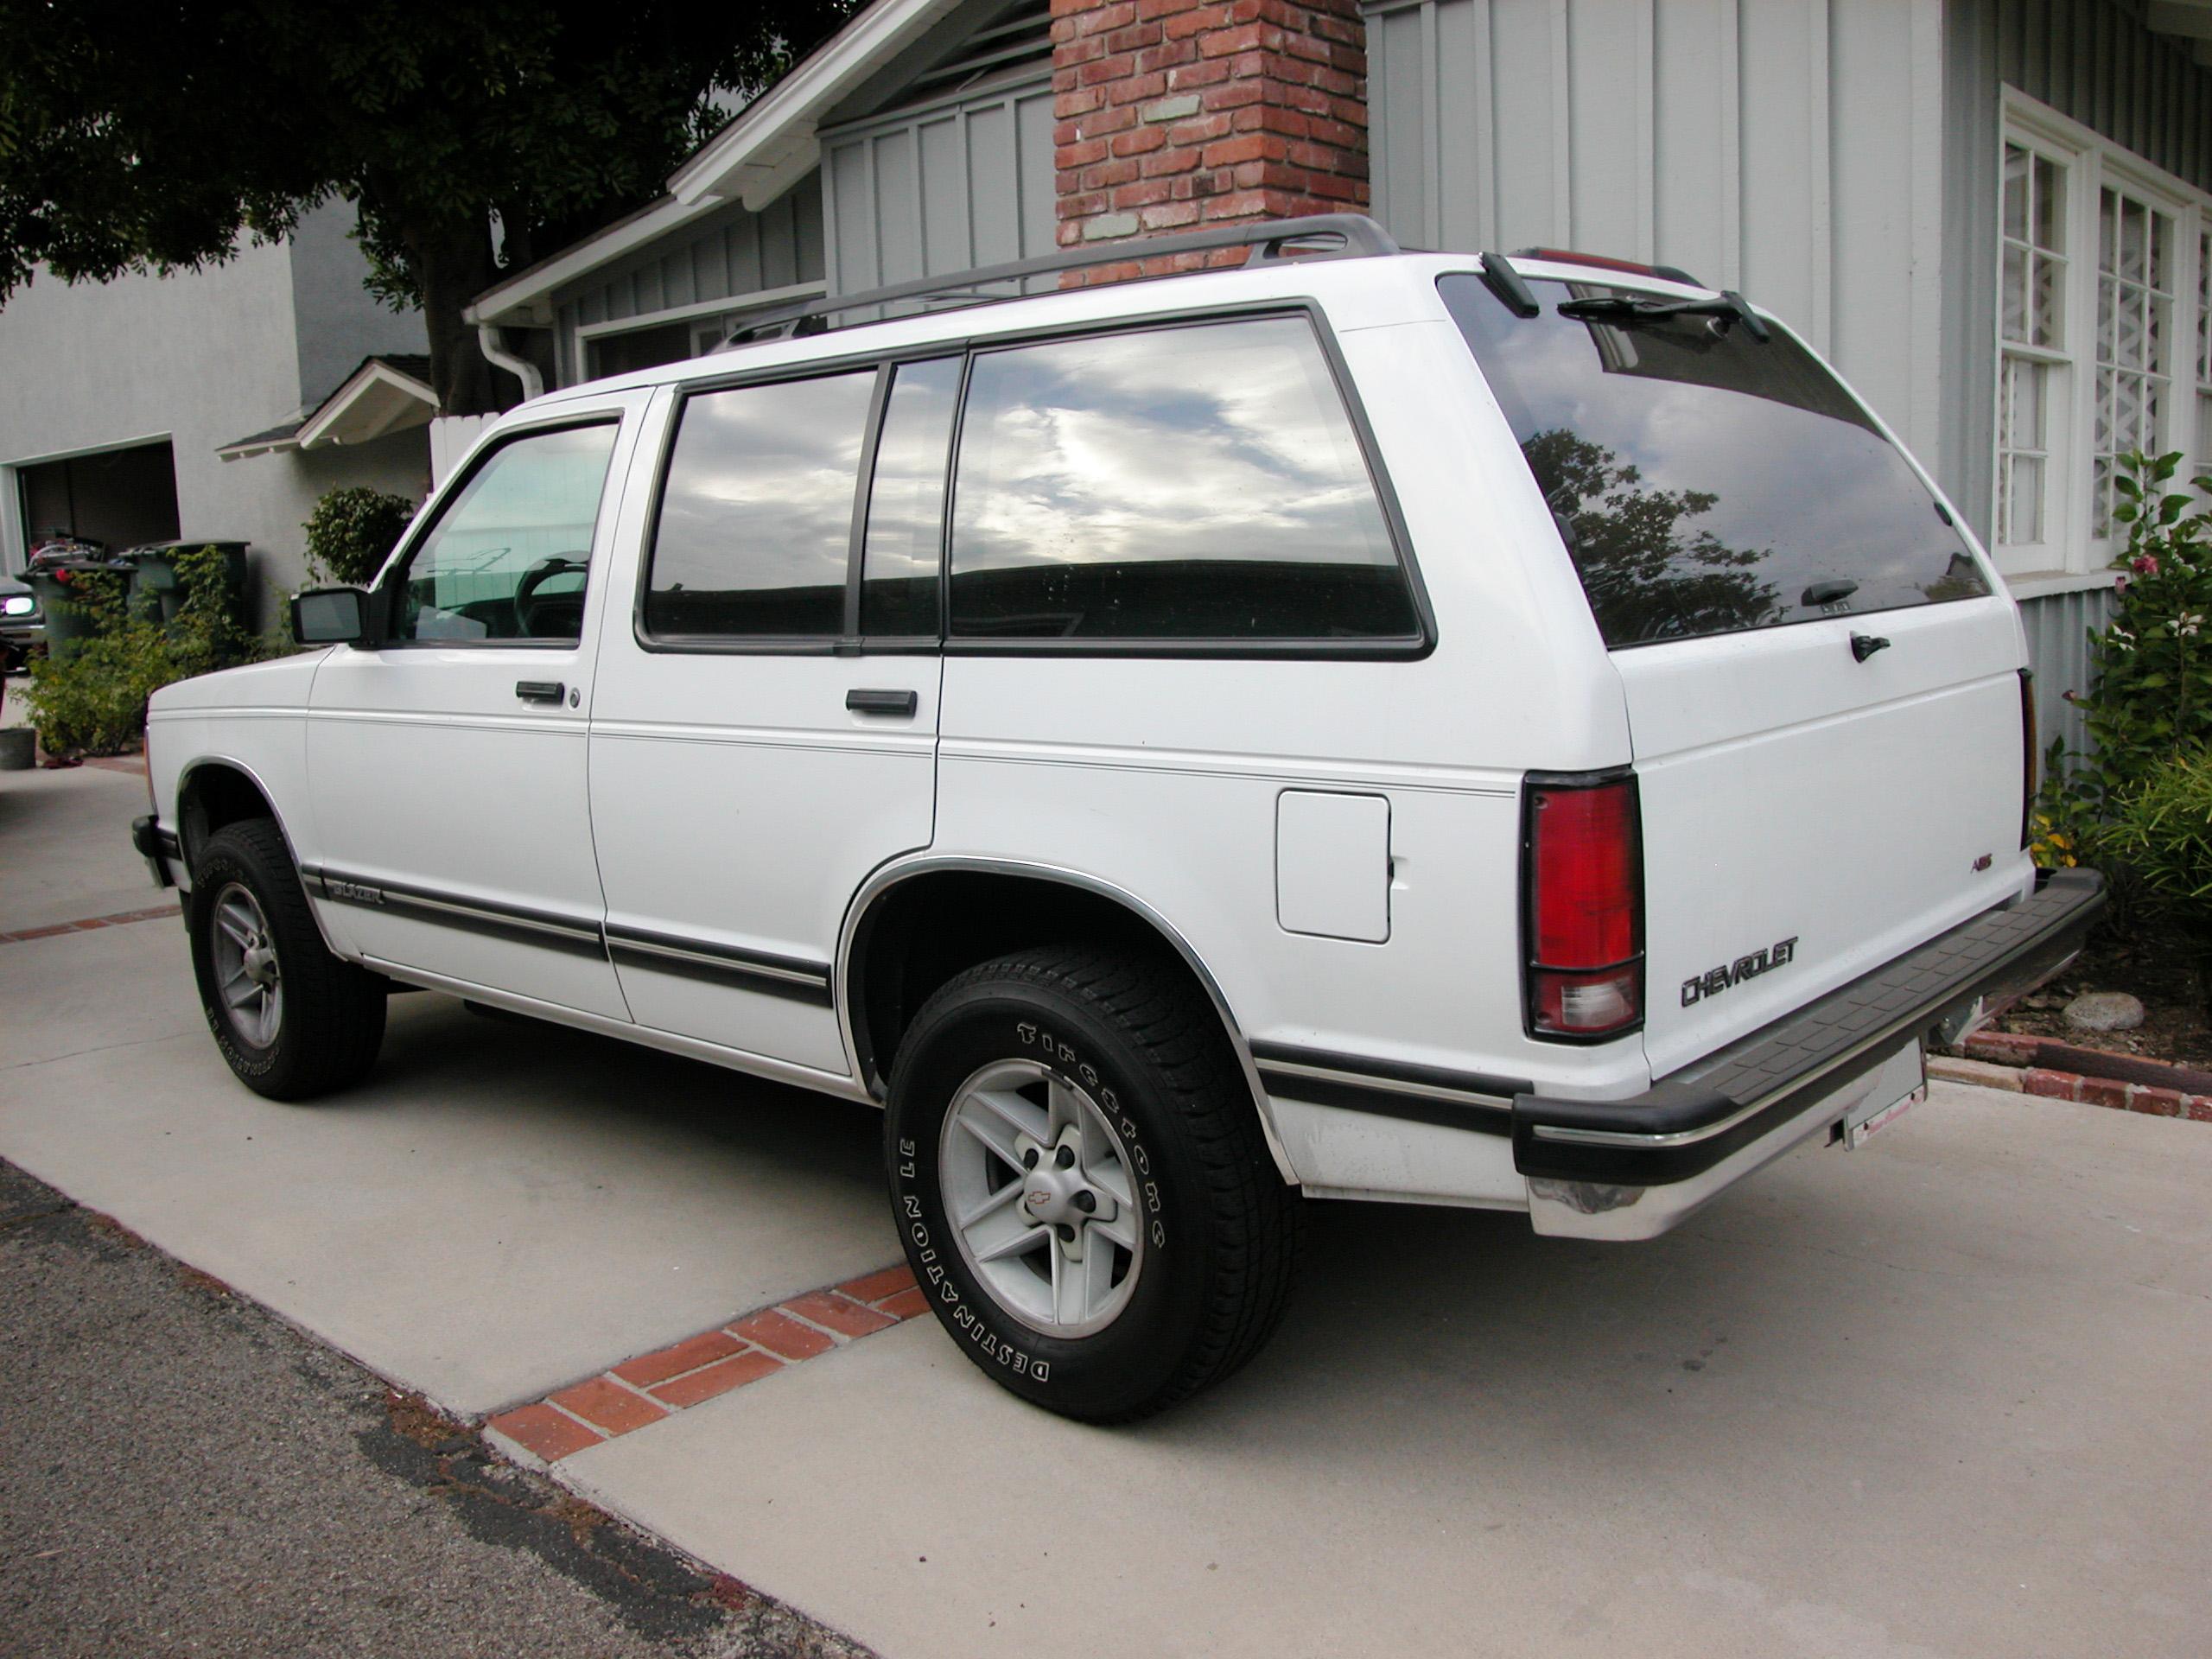 1994 Chevrolet S-10 Blazer - Partsopen